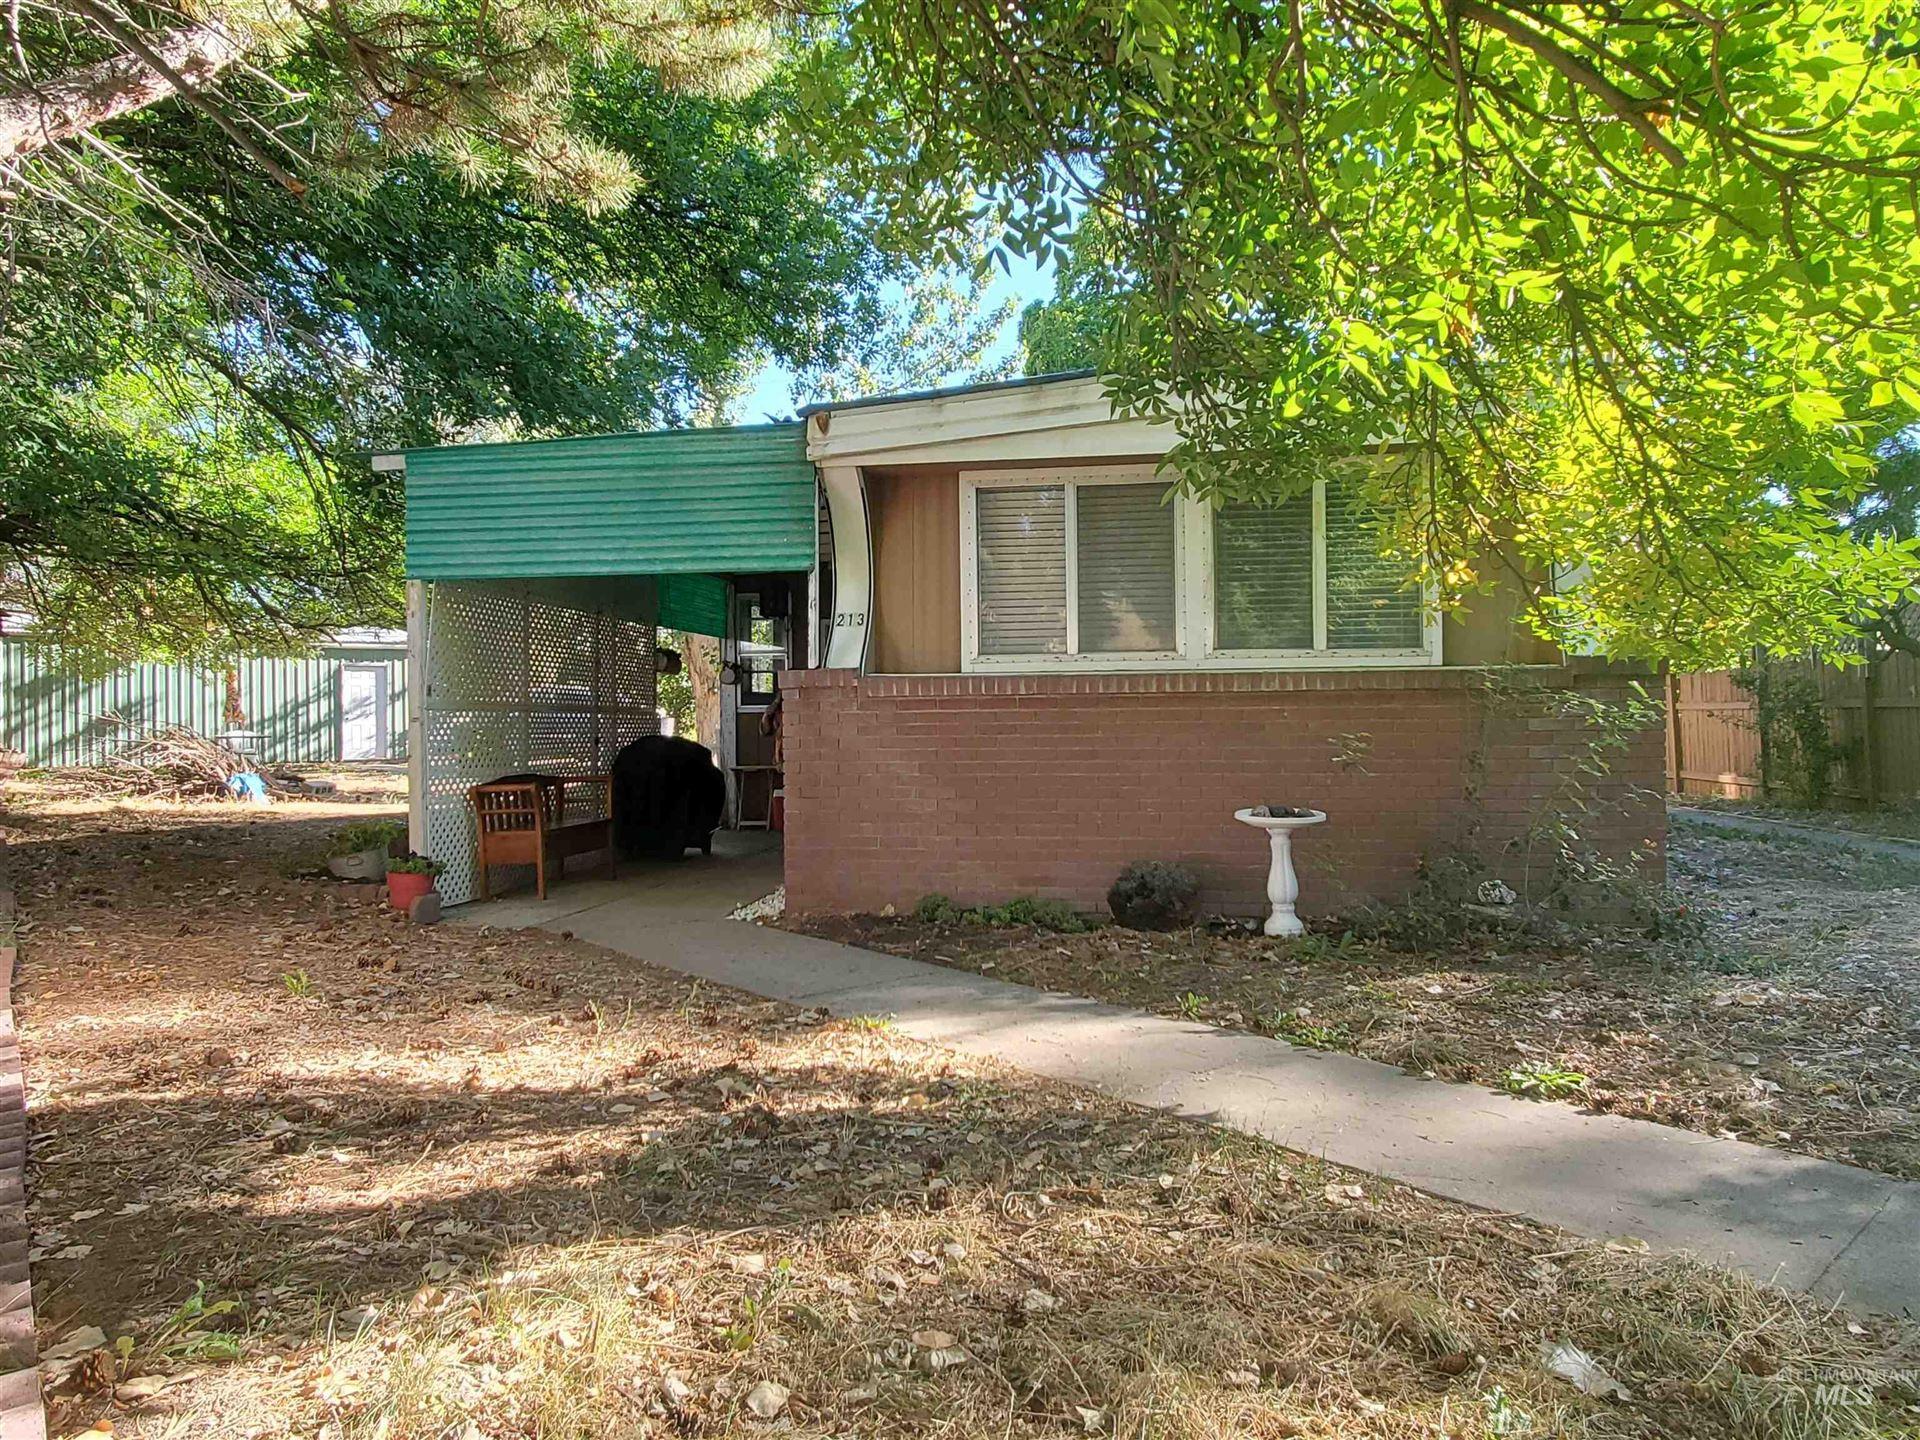 213 W Ave D, Jerome, ID 83338 - MLS#: 98819802